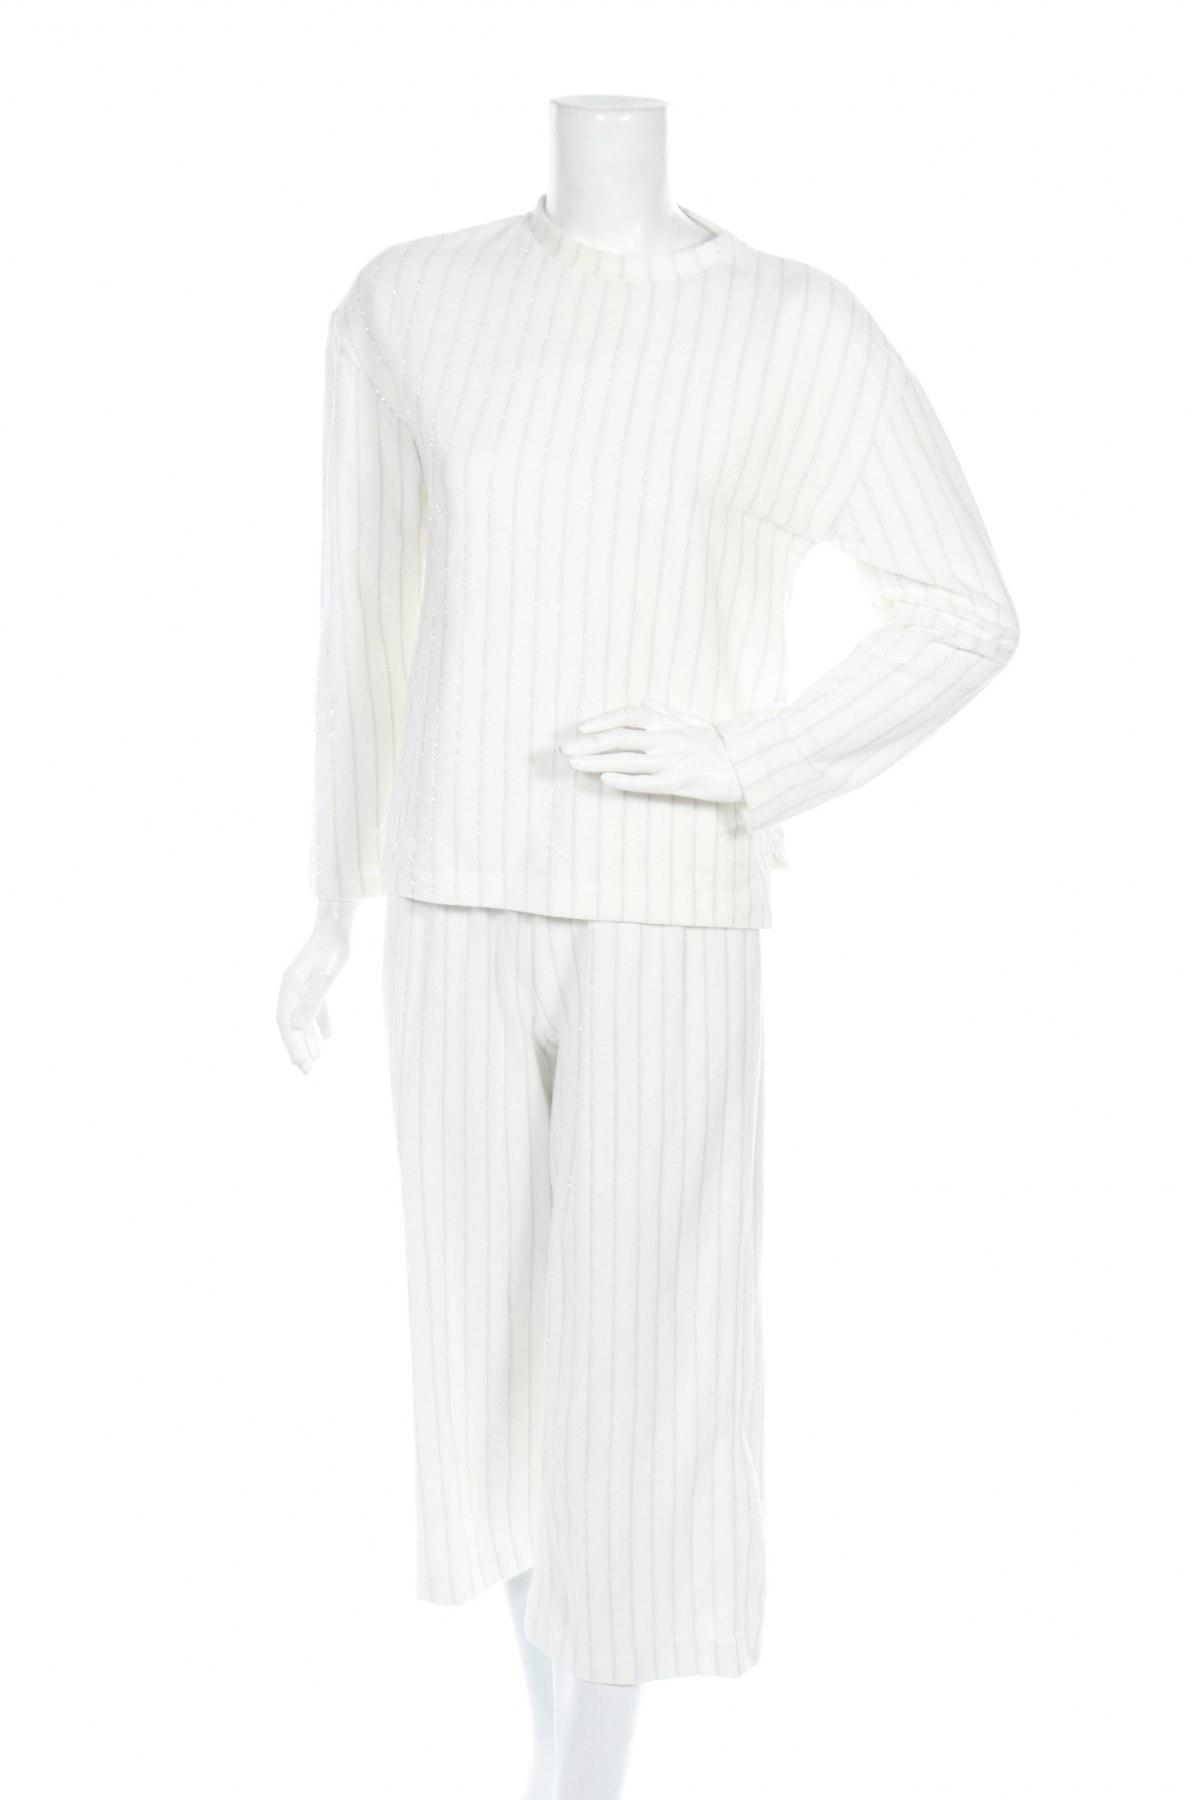 Комплект Even&Odd, Размер S, Цвят Бял, 75% памук, 22% полиестер, 3% метални нишки, Цена 27,00лв.